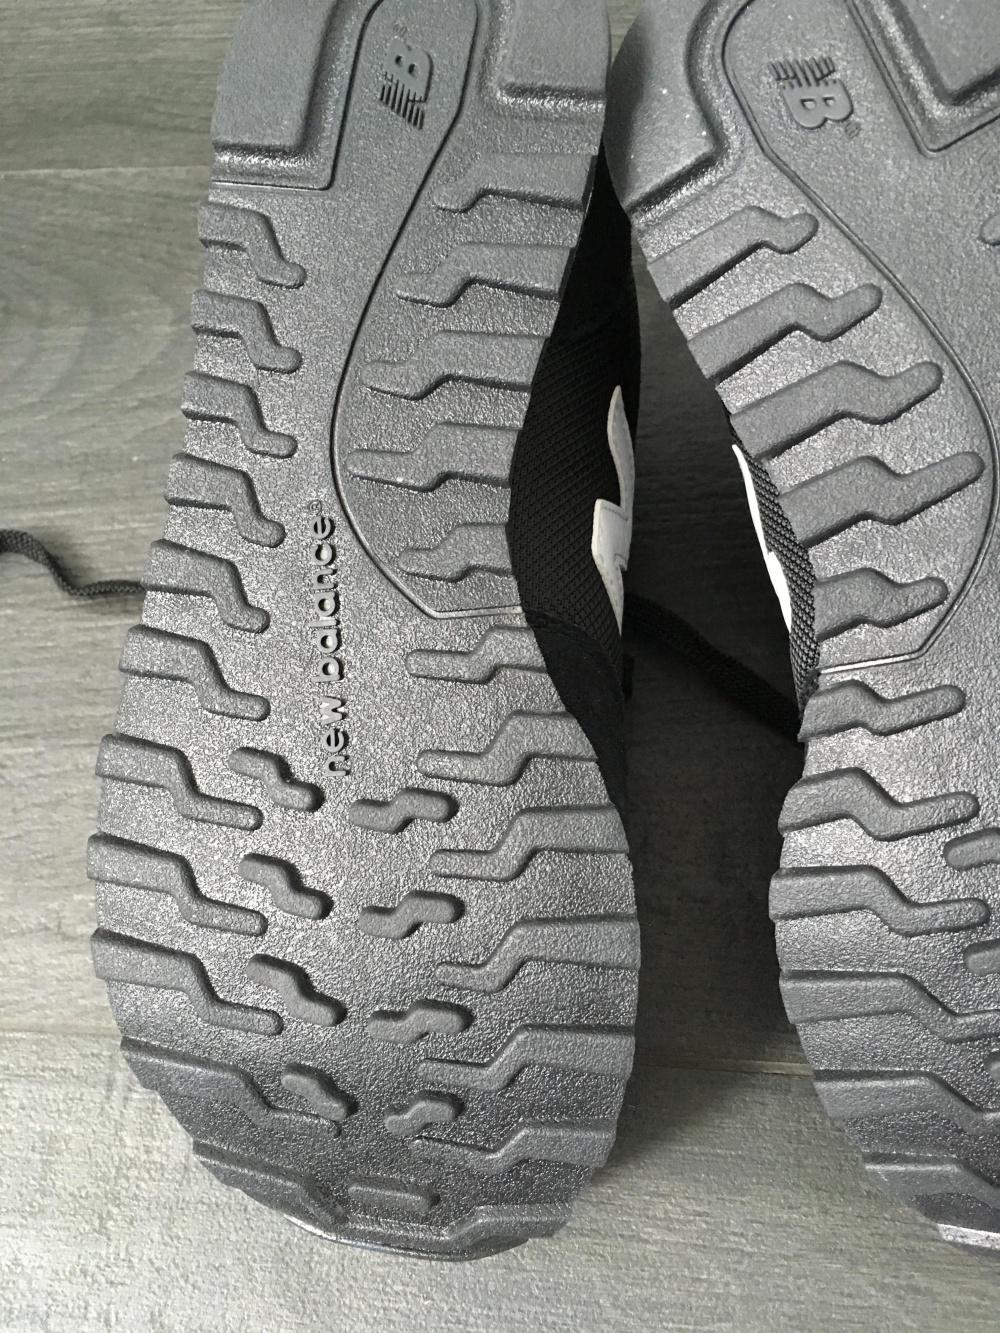 Кроссовки New Balance 311, 36 размер, 100% оригинал из Америки